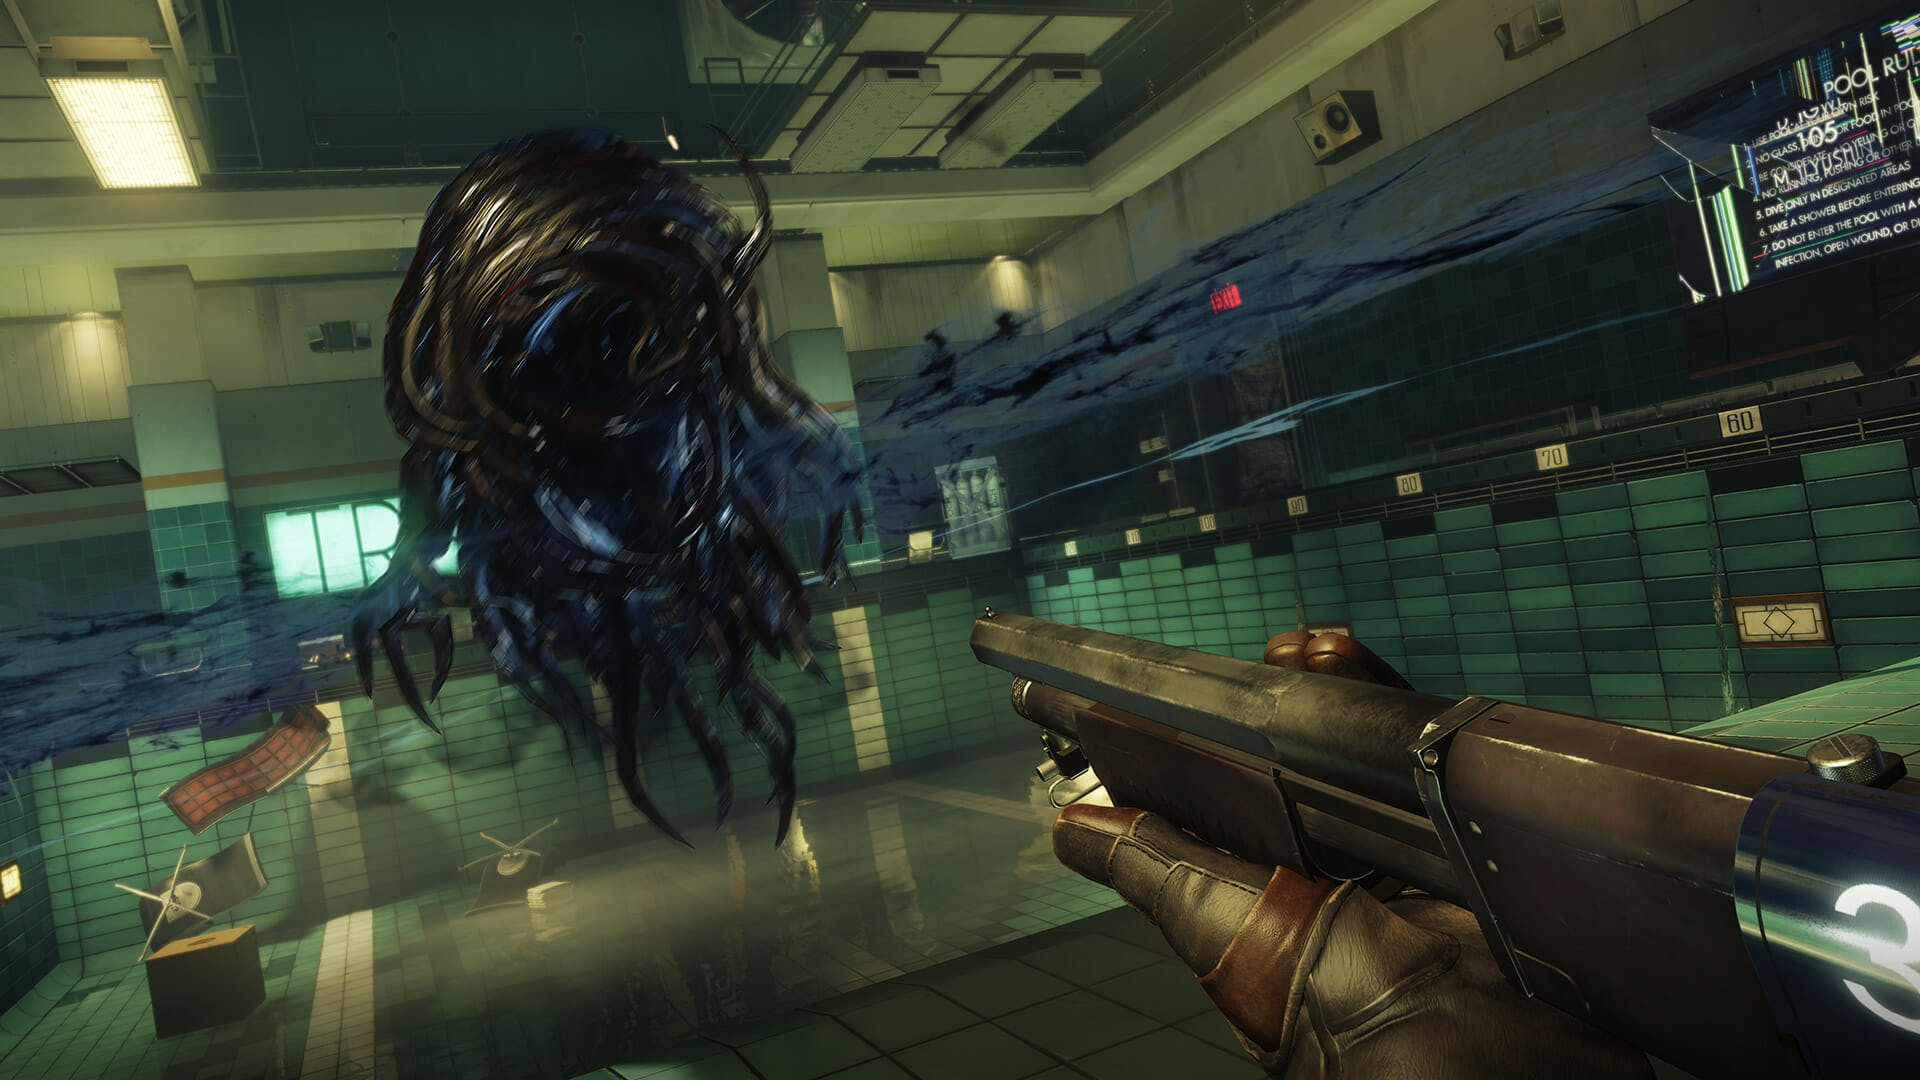 best video games 2017 : Prey